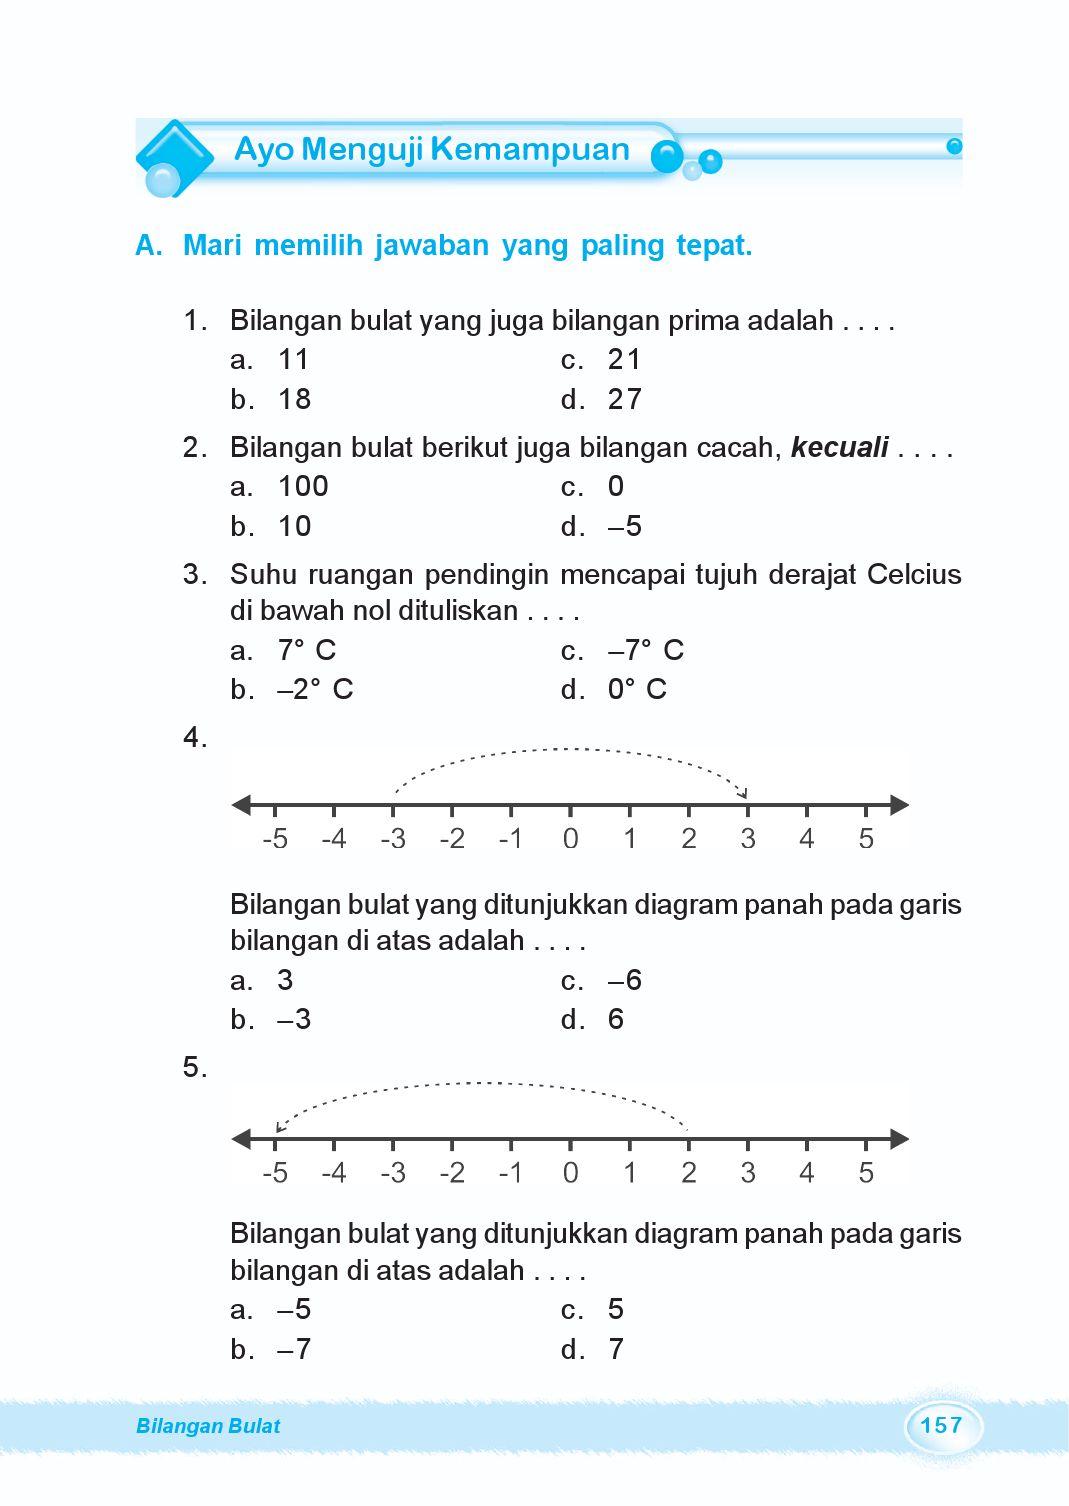 Kelas04ayo belajar matematikaburhan ary by s van selagan issuu ccuart Images